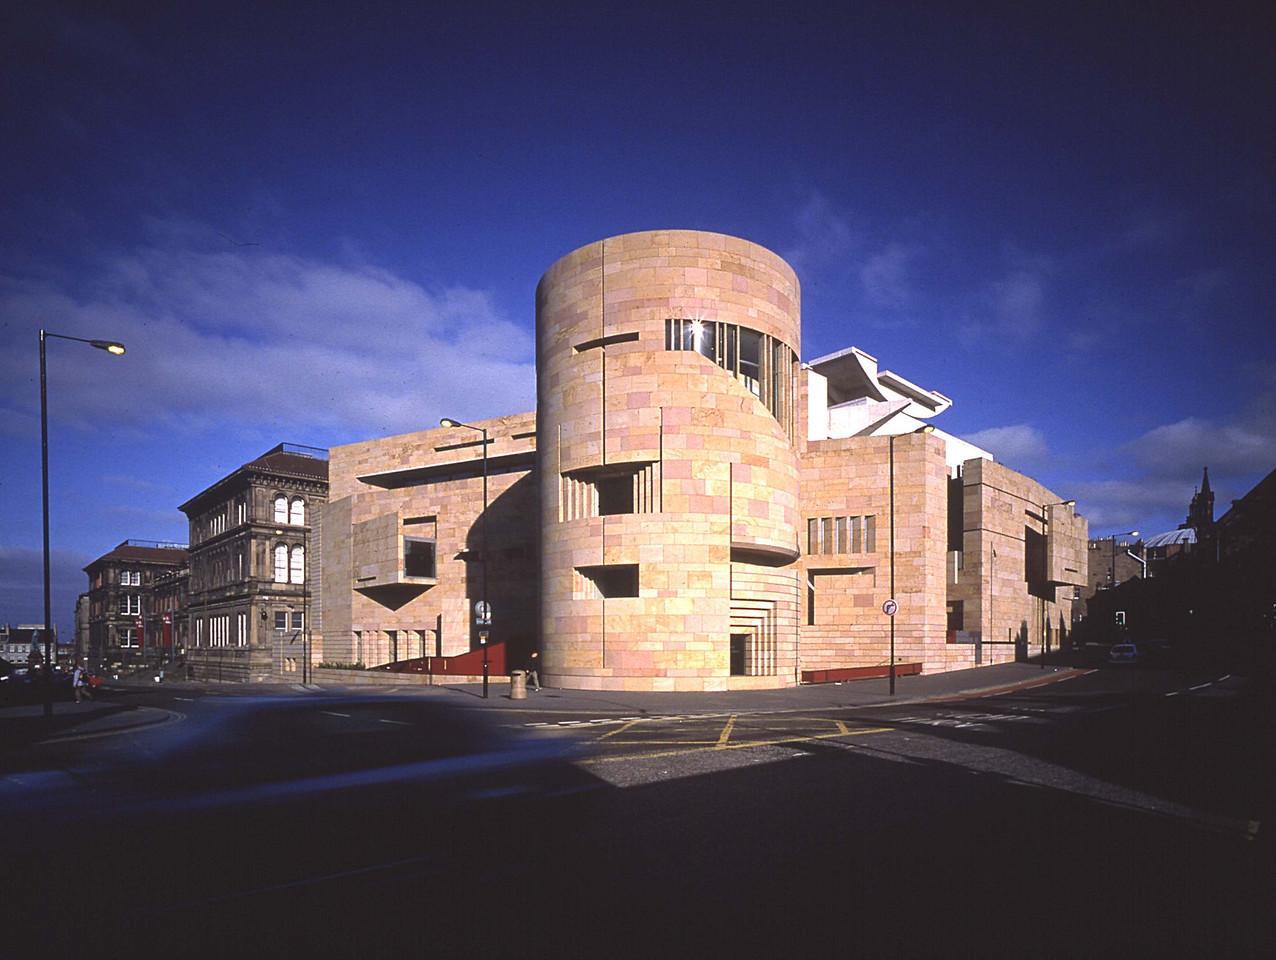 NATIONAL MUSEUMS SCOTLAND : National Museum of Scotland